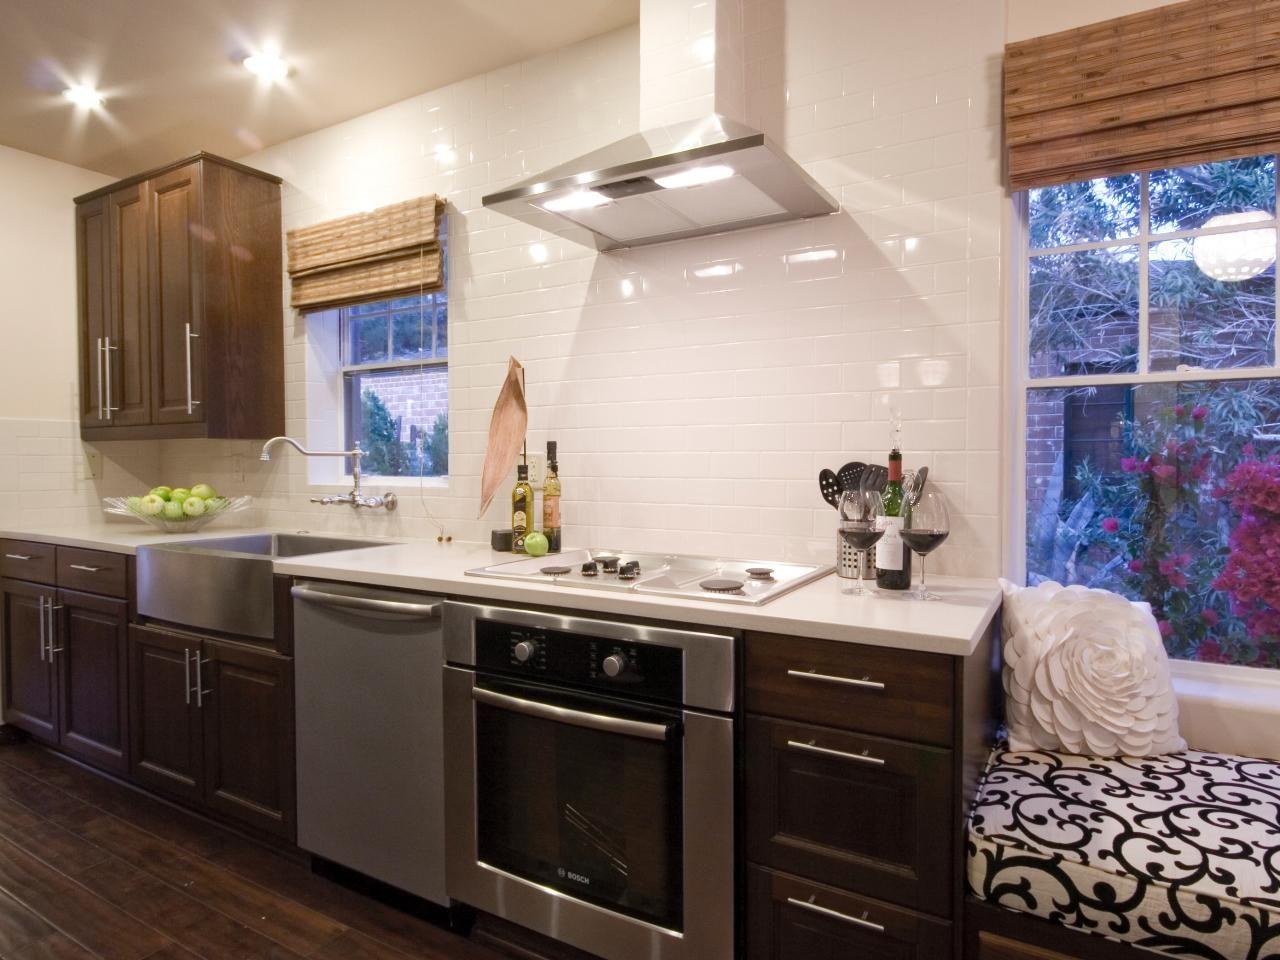 This kitchen features white quartz countertops, a deep ...